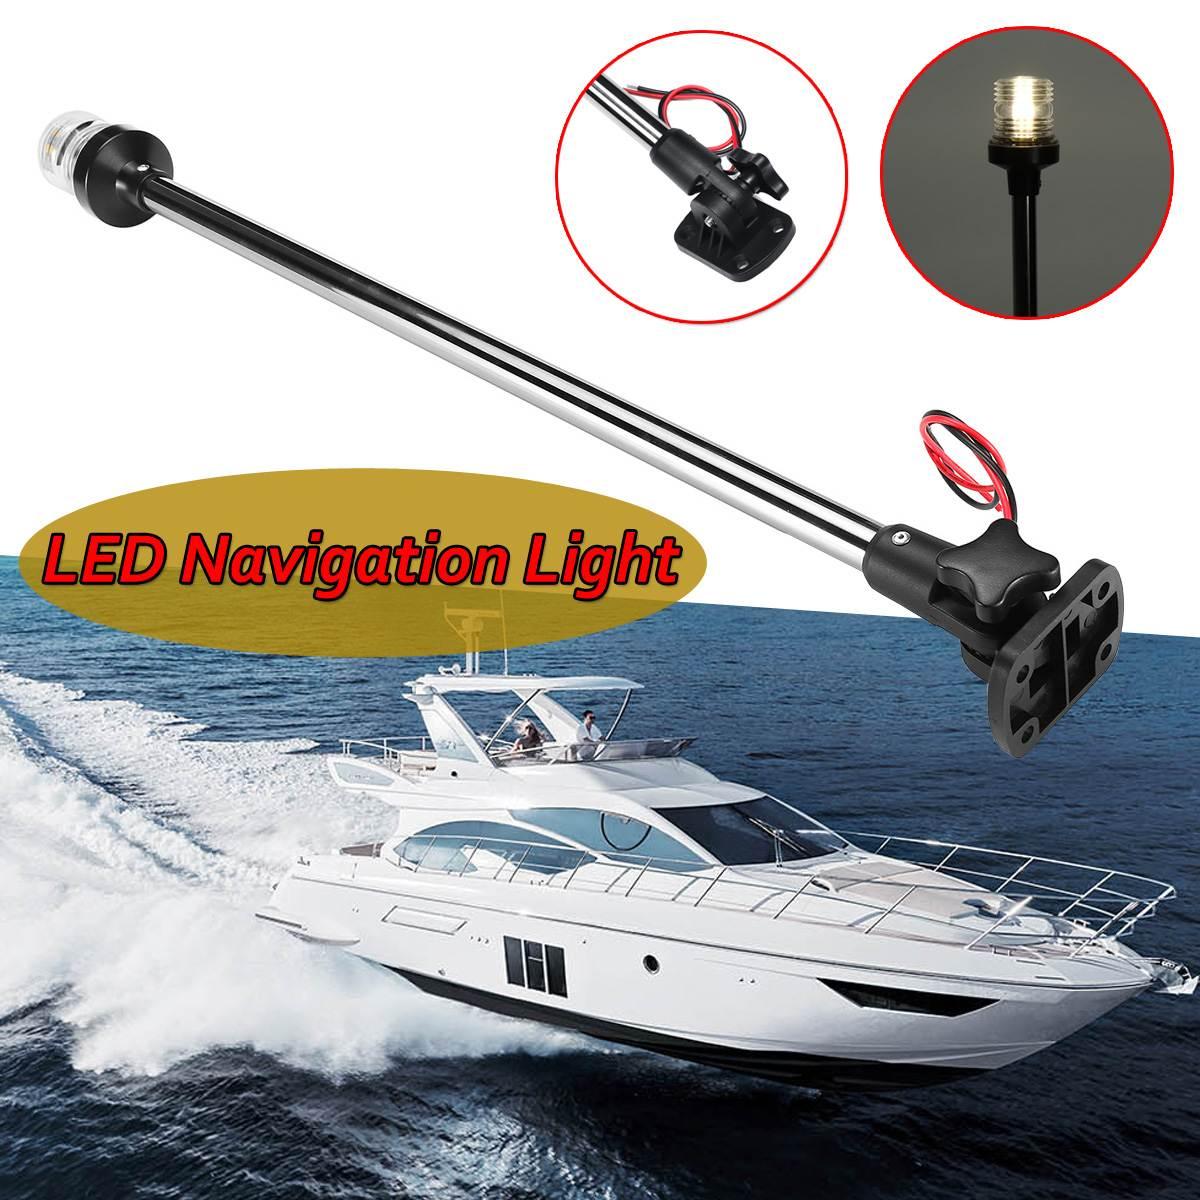 "Fold Down 12-24V 9.8''/ 16''/25"" Marine Boat LED Navigation Lights Marine Boat Yacht Stern Anchor Light LED Sailing Light Lamp(China)"